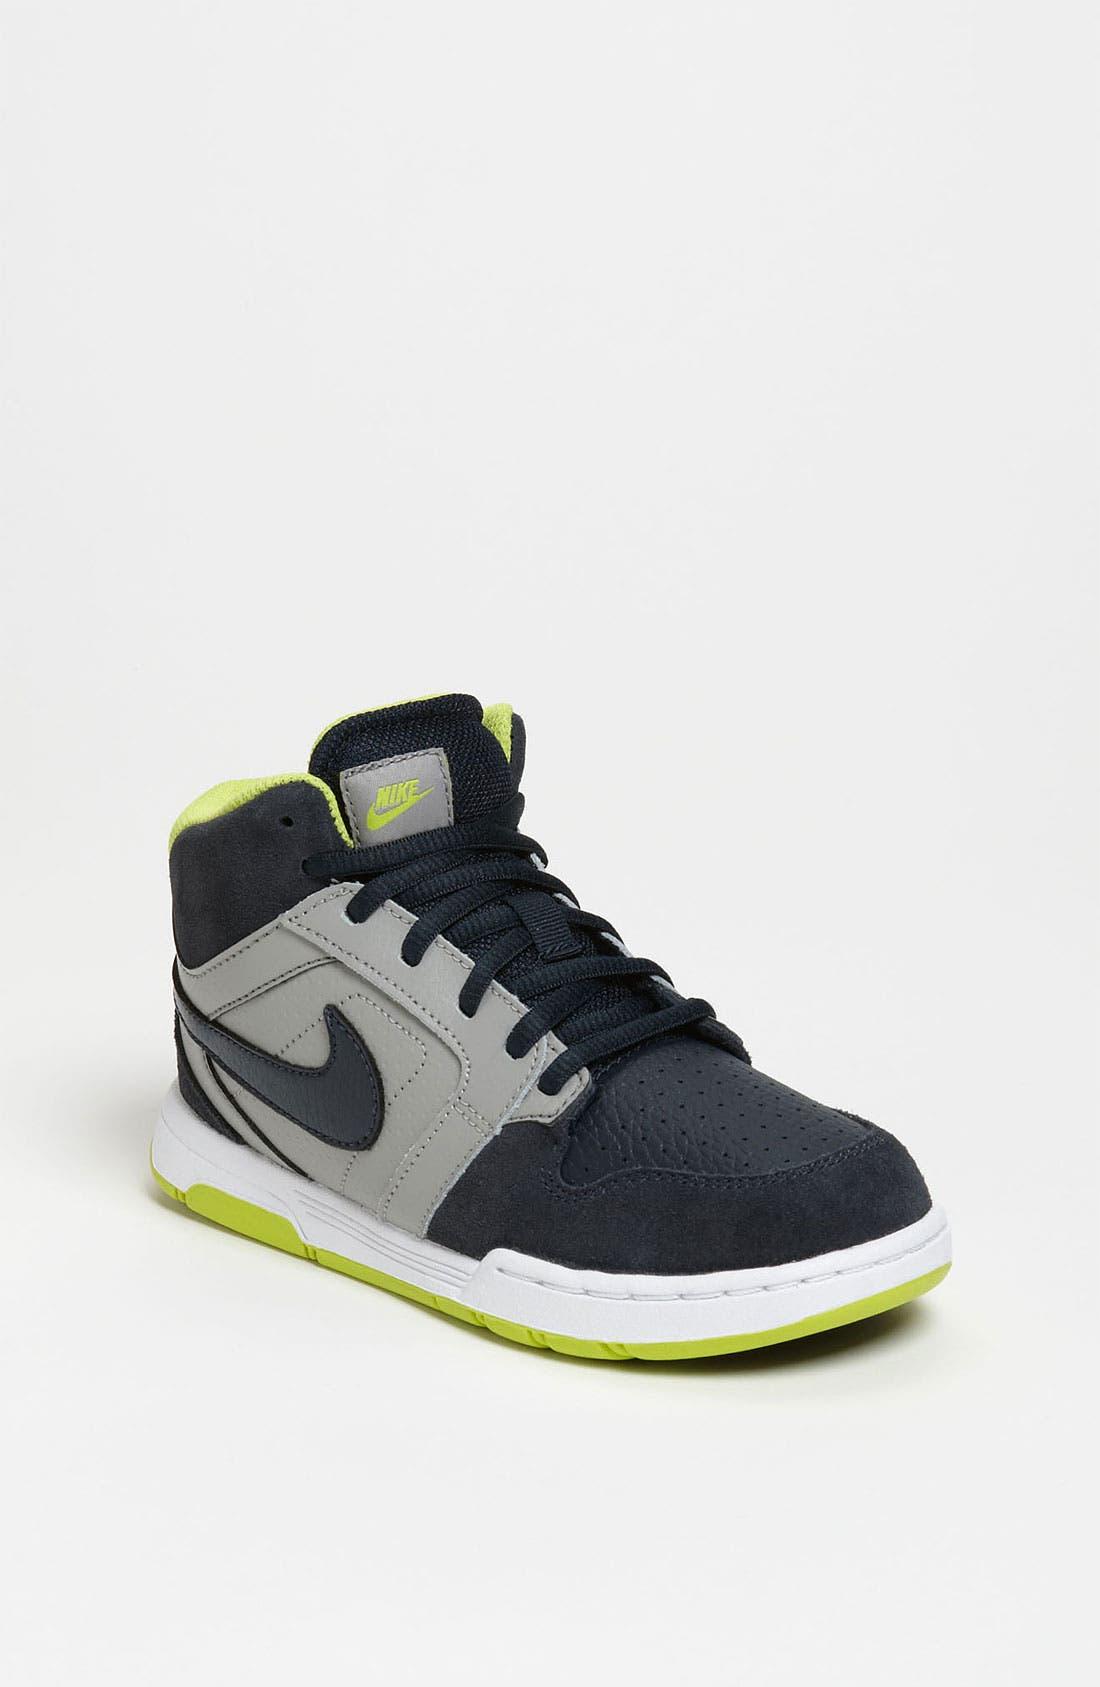 Alternate Image 1 Selected - Nike 'Mogan Mid 3' Sneaker (Toddler, Little Kid & Big Kid)